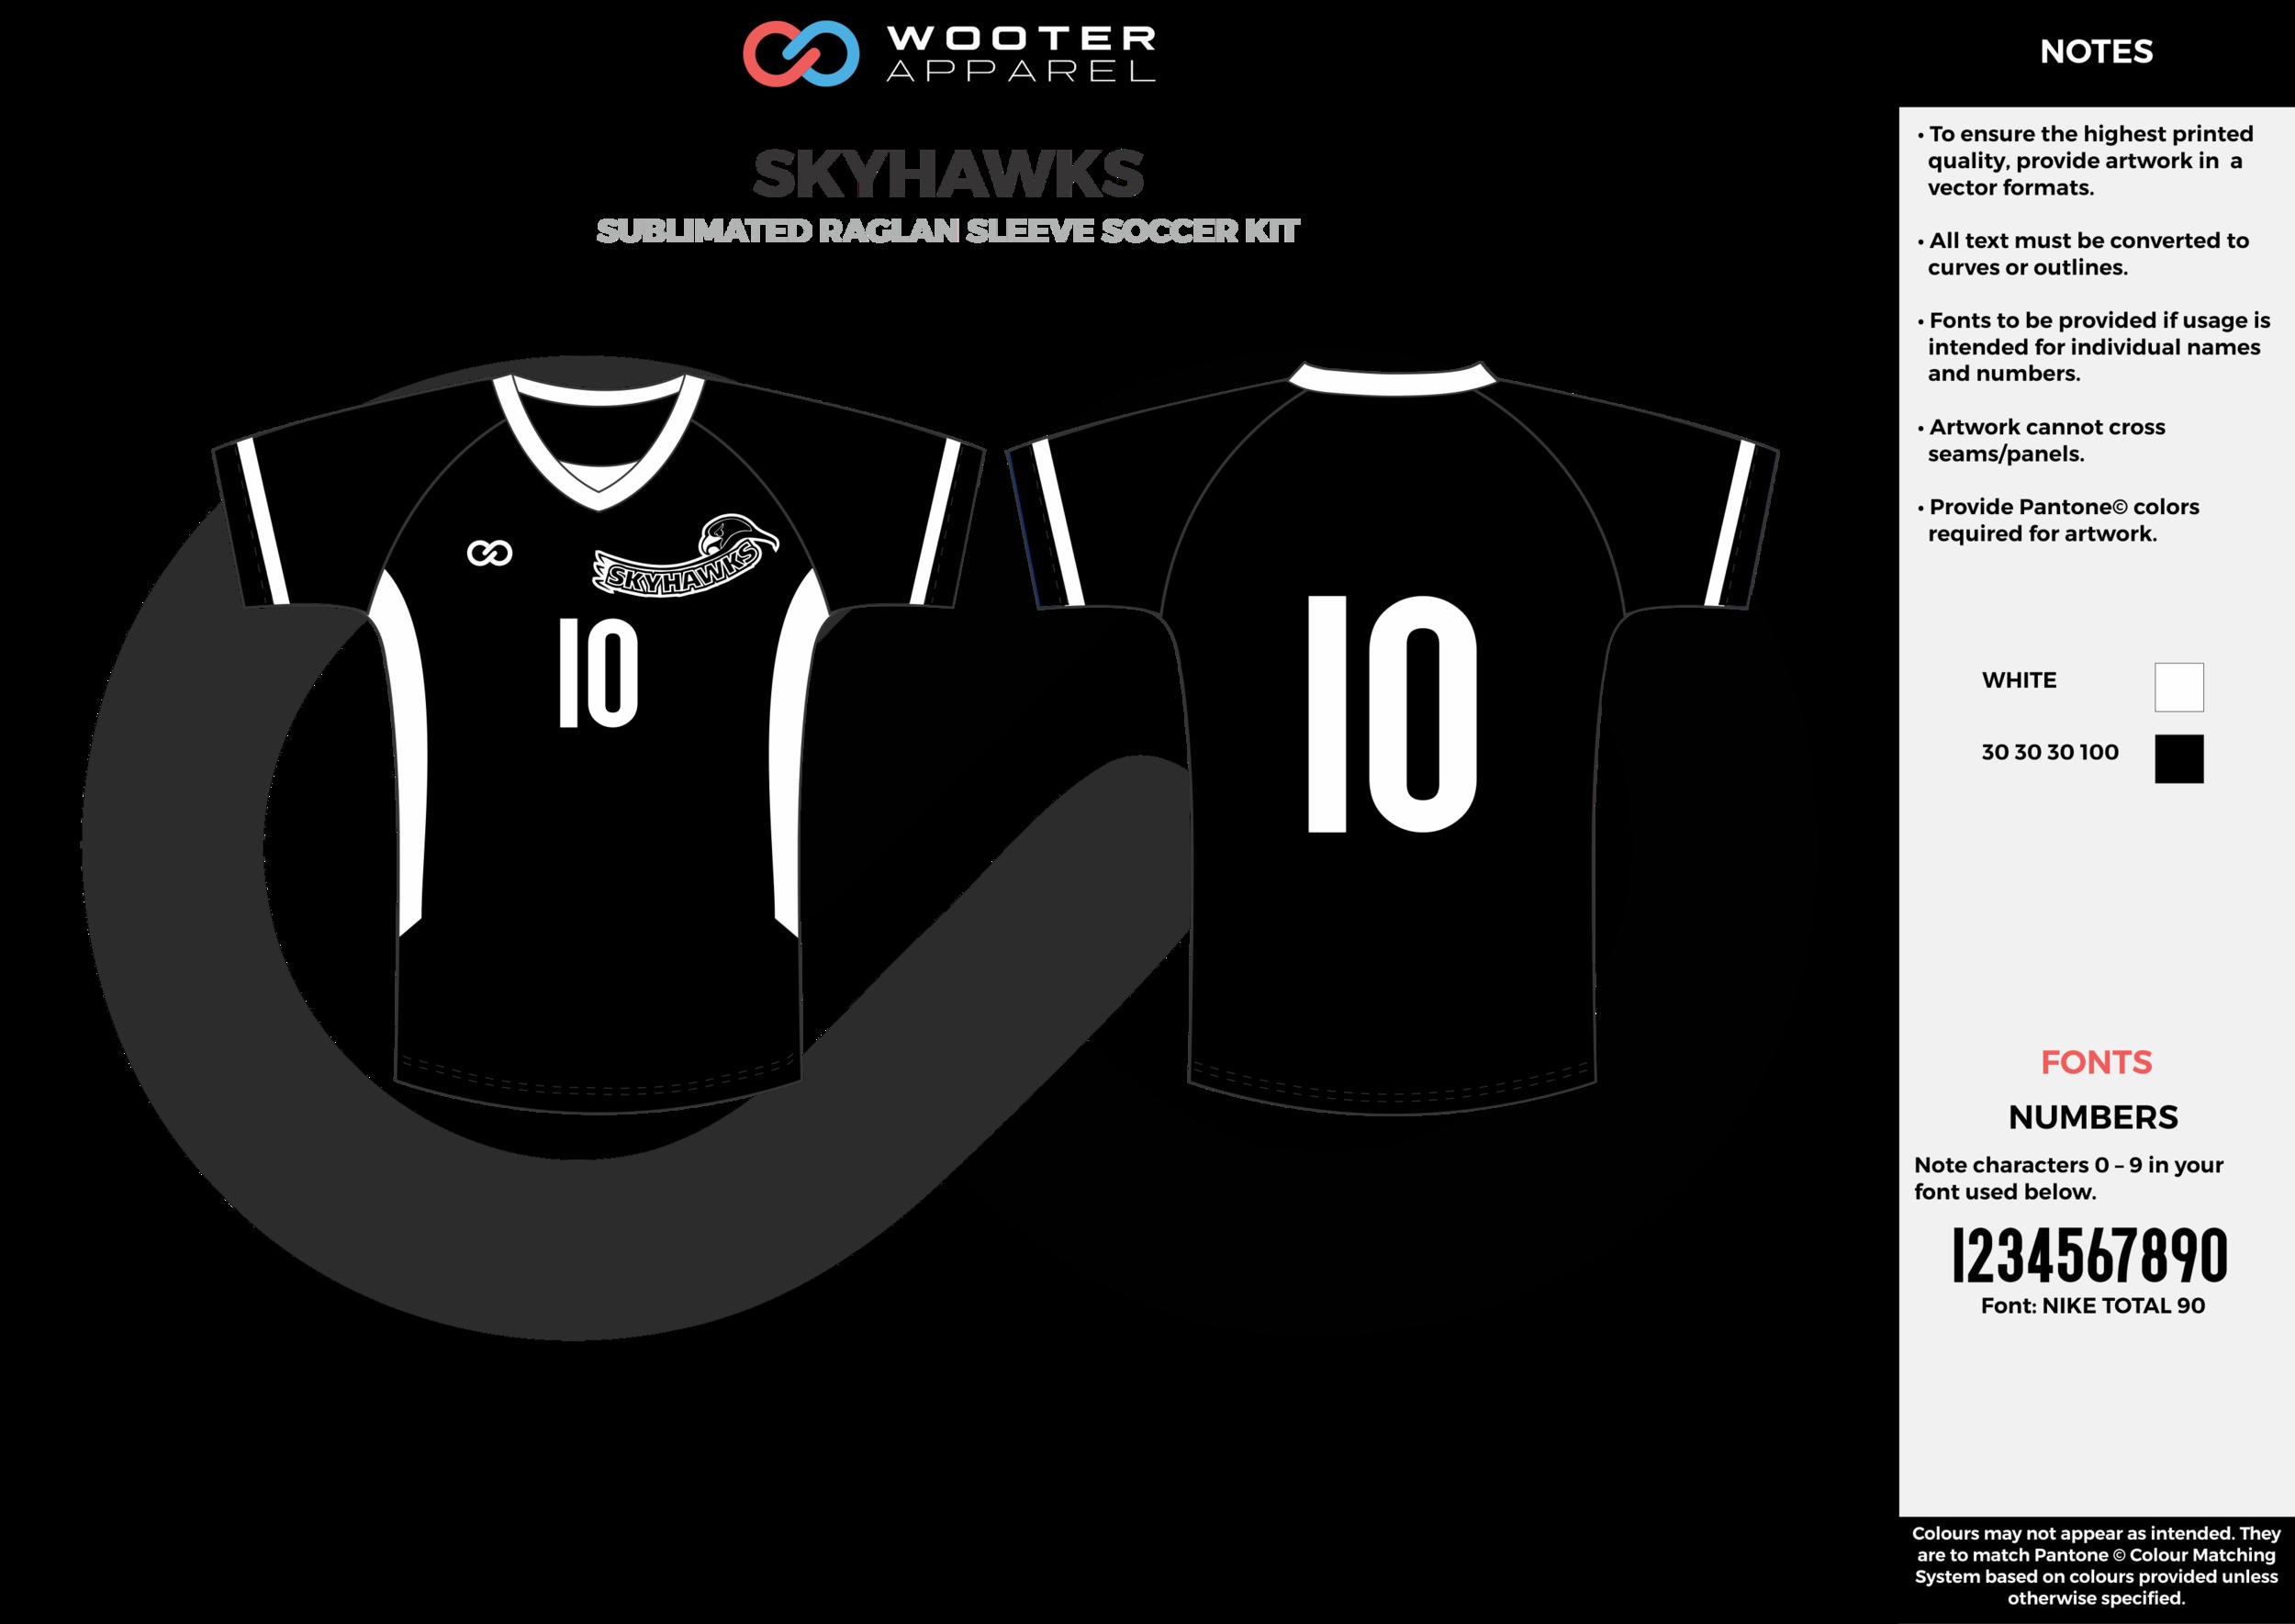 SKYHAWKS black white custom sublimated soccer uniform jersey shirt